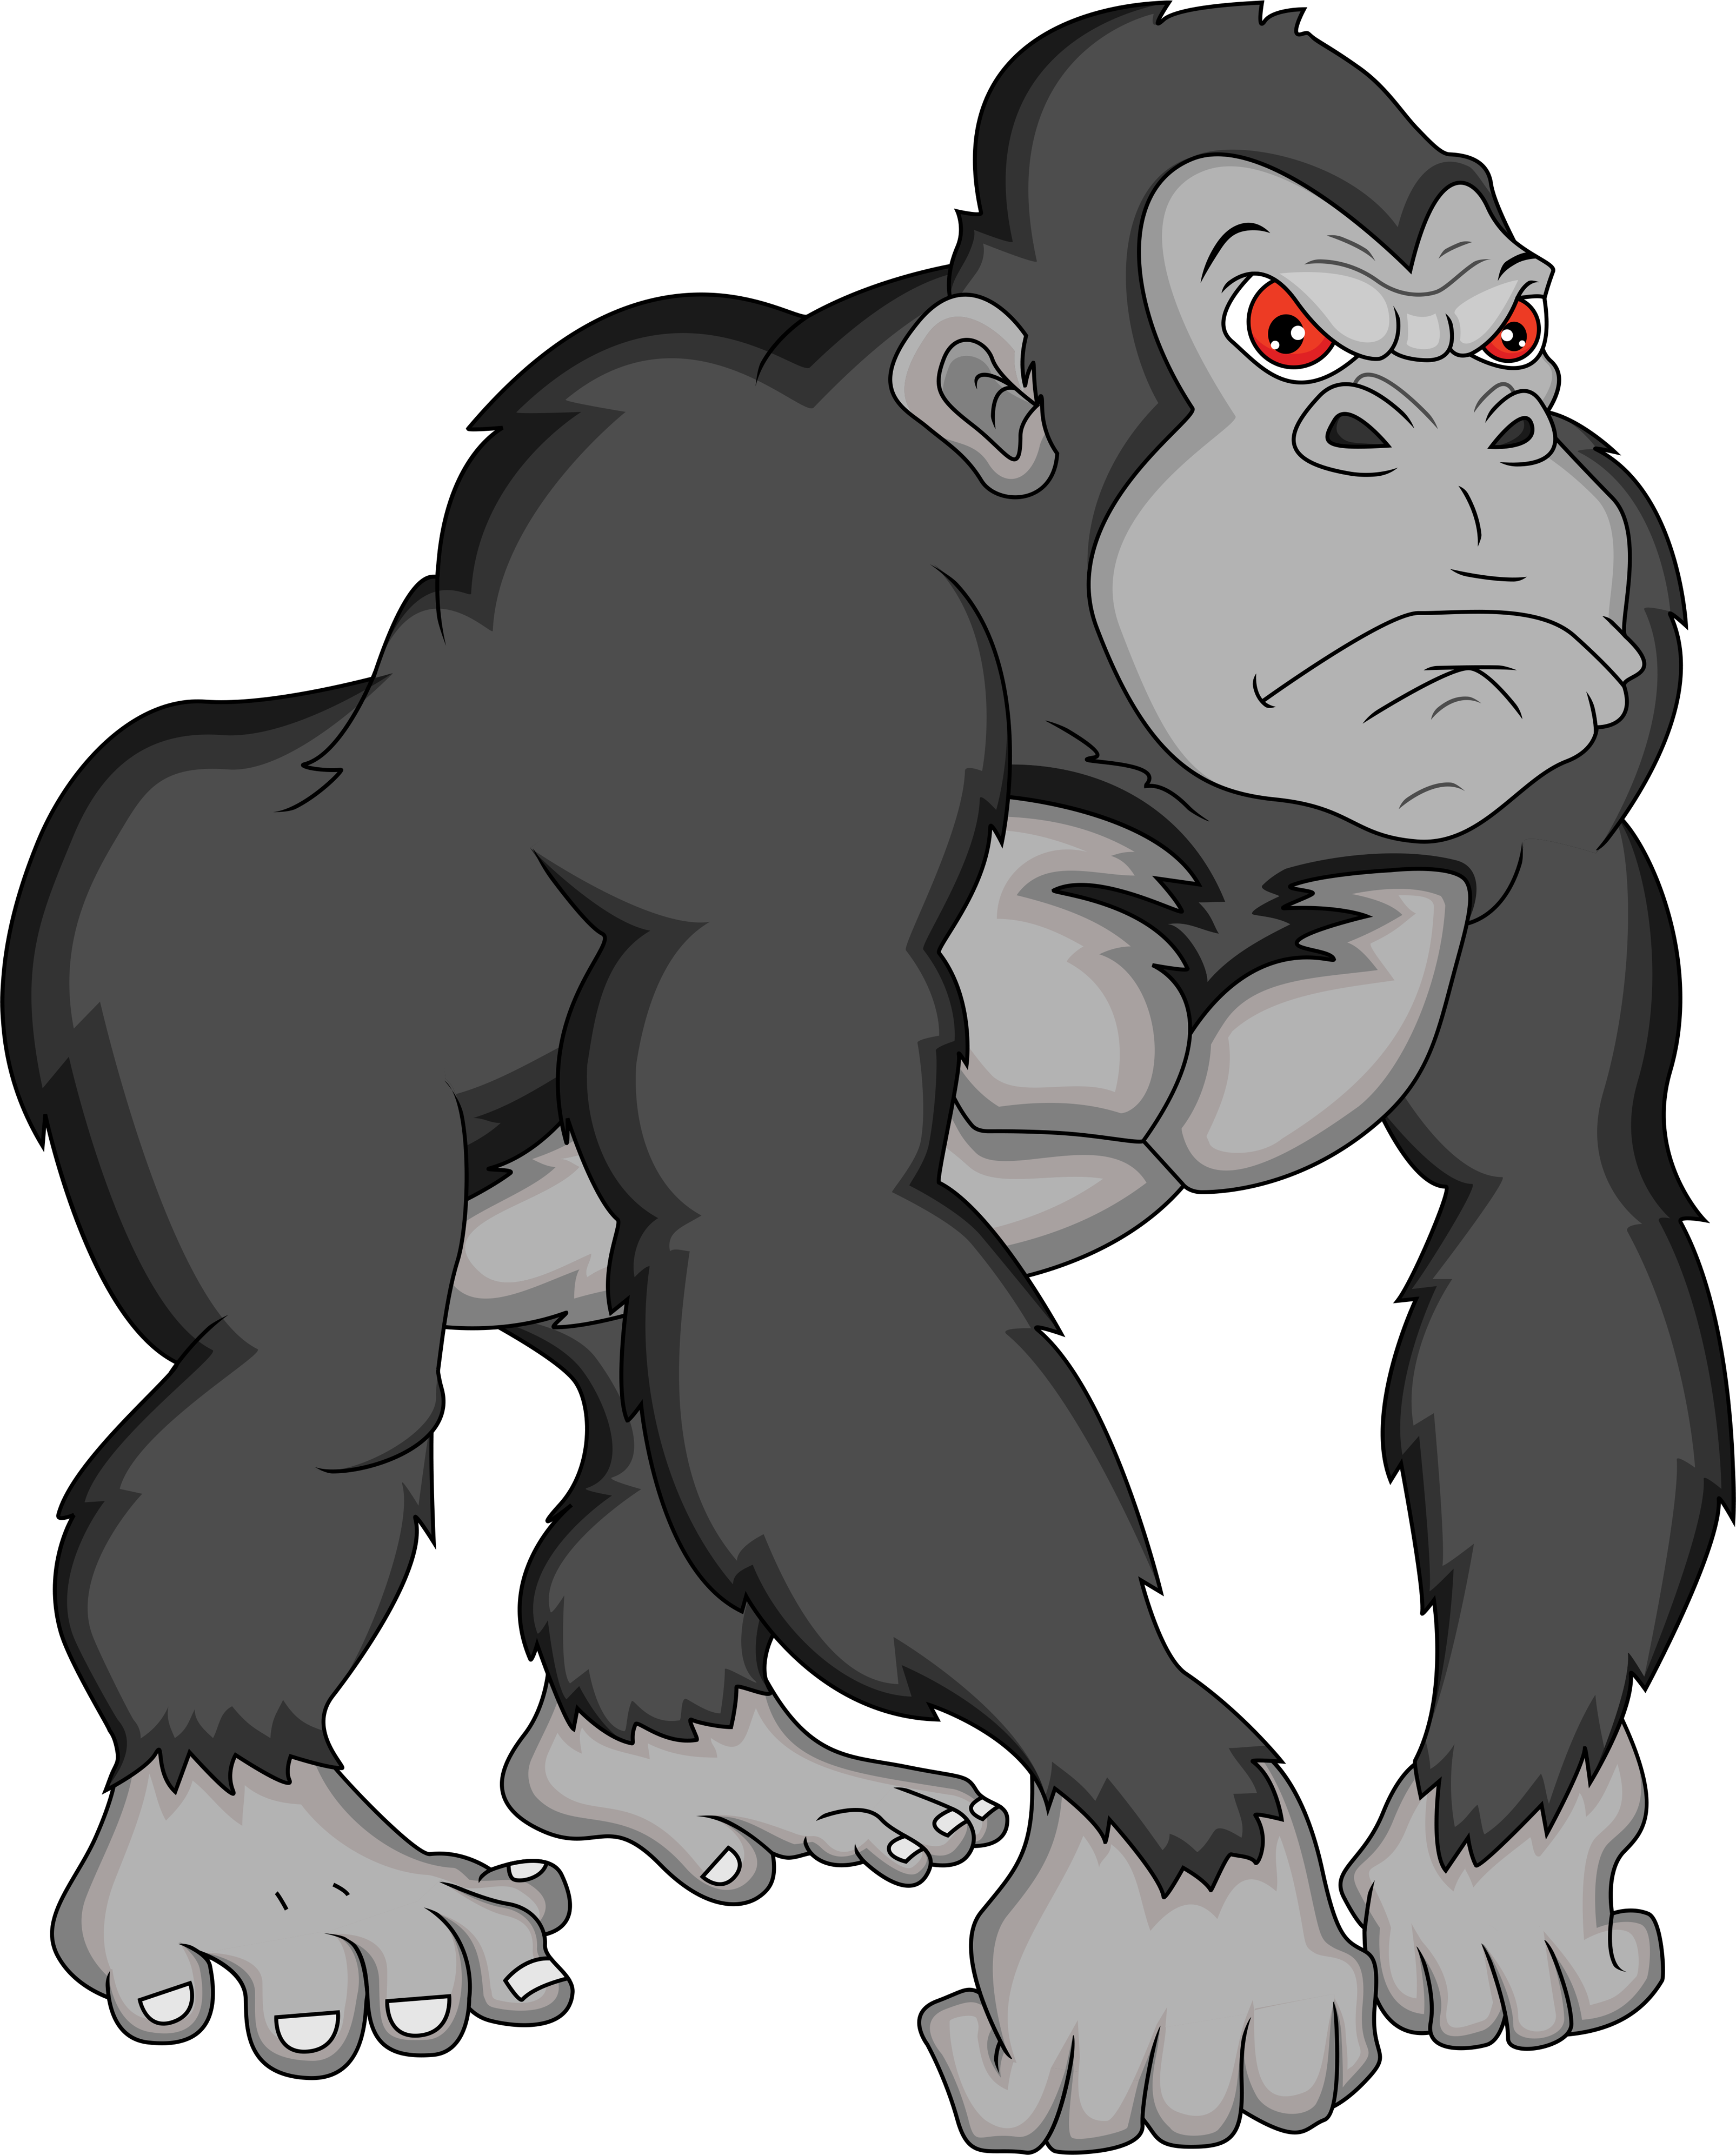 Hentai gorilla adult galleries